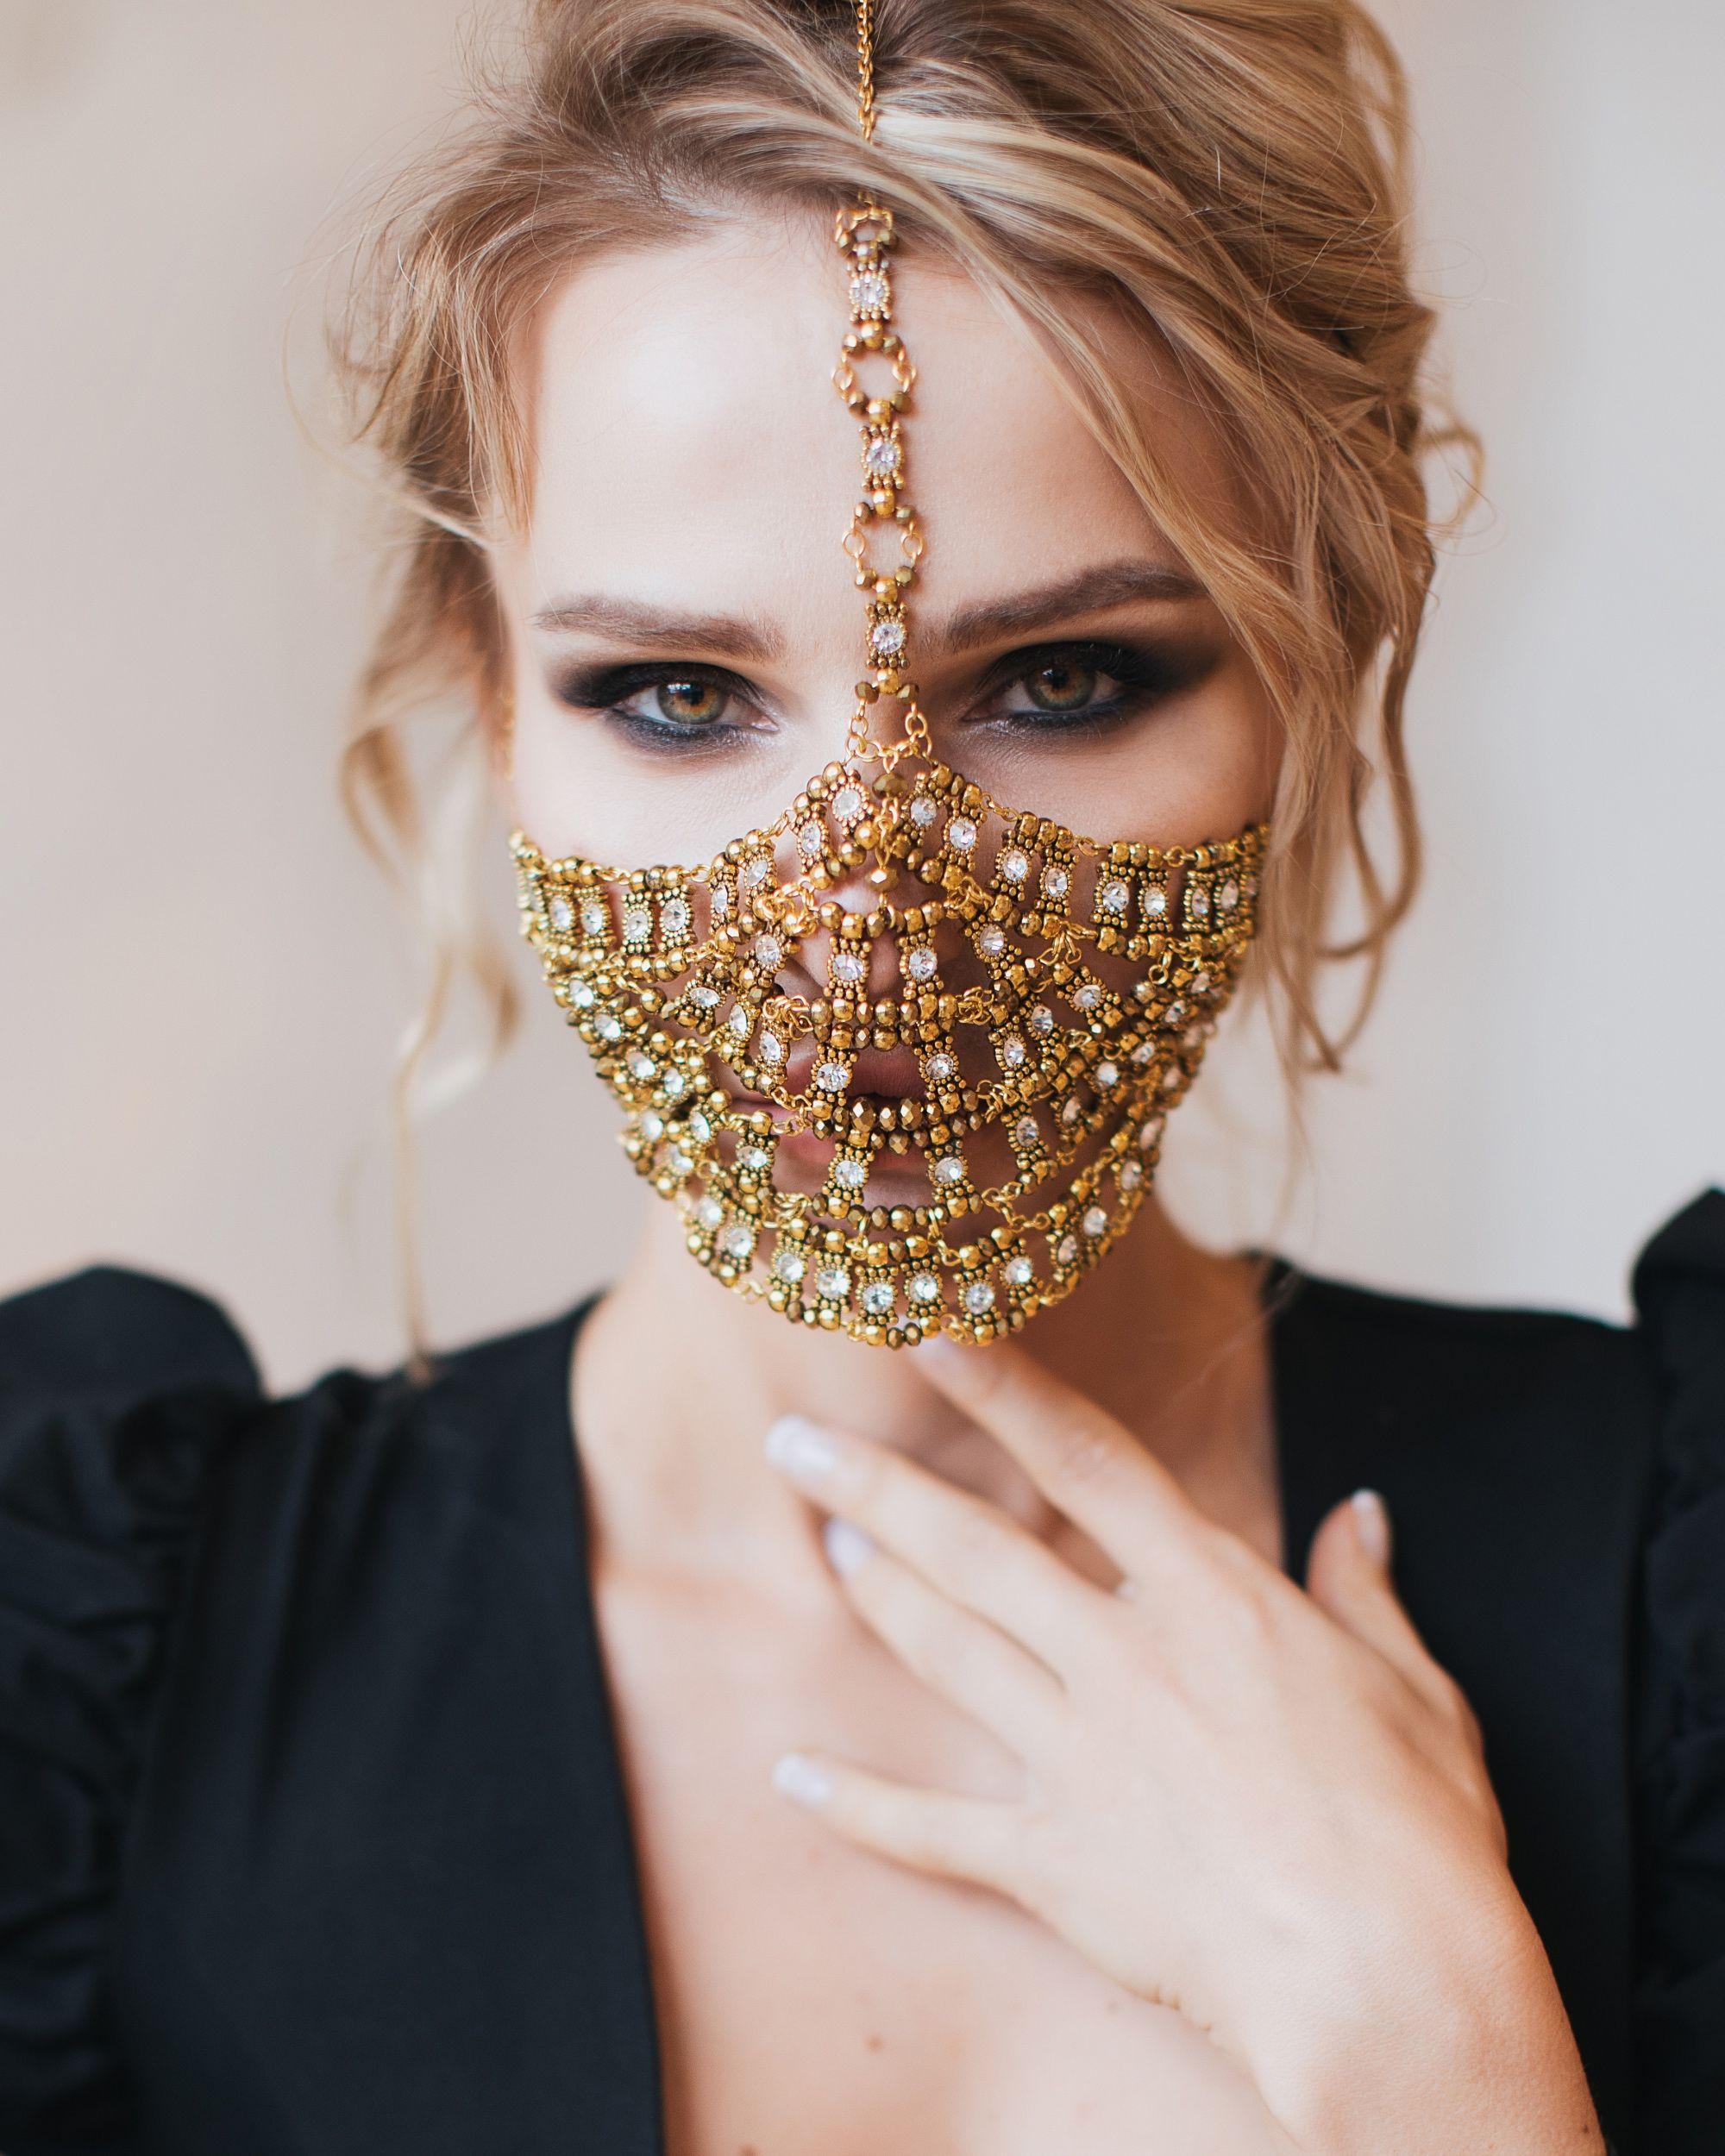 face mask Fashion face mask, Face jewellery, Mouth mask